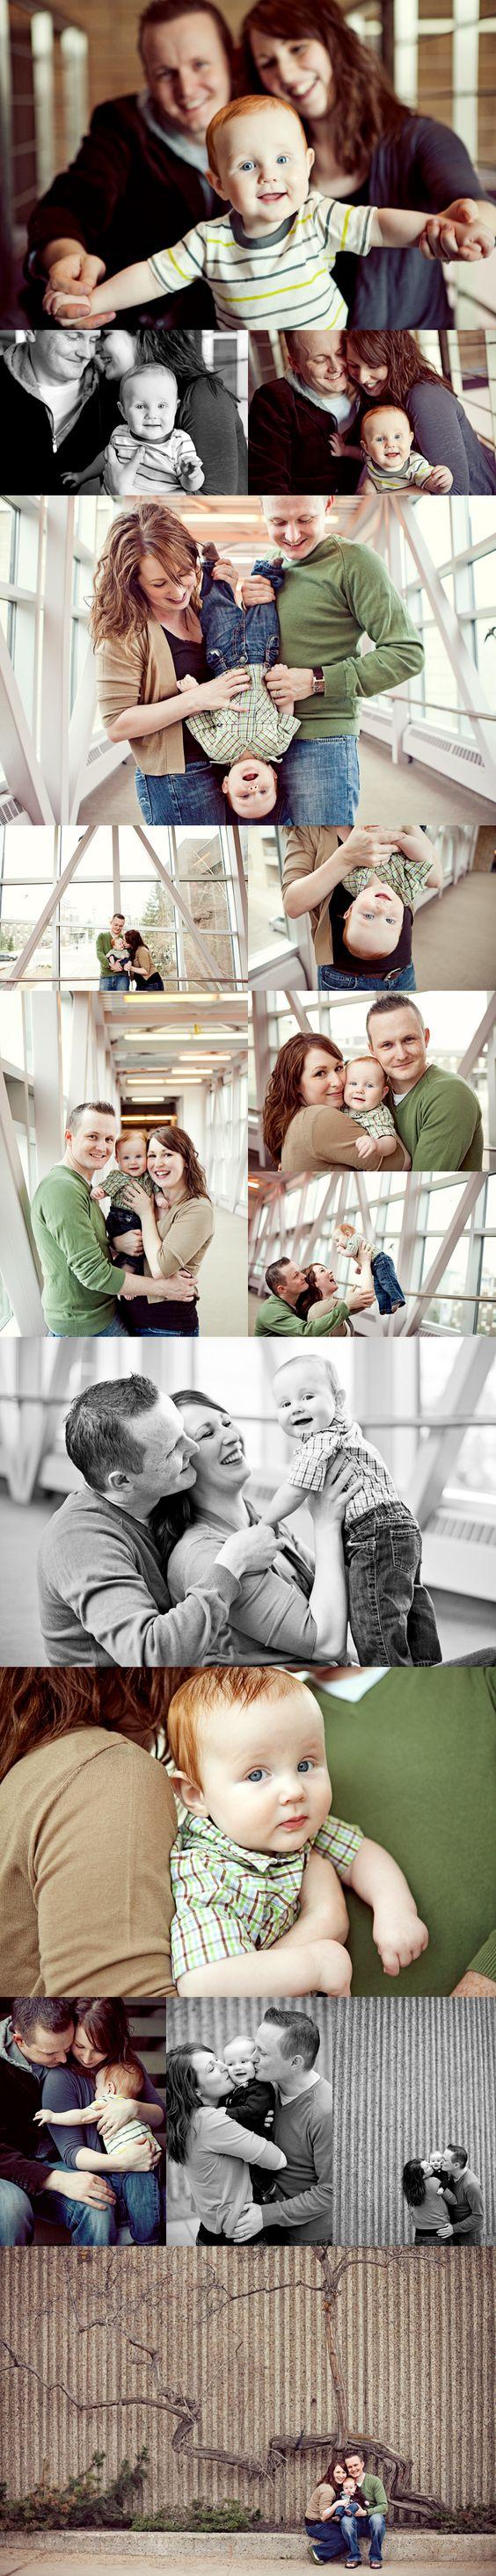 ideas for @Meagan Smith's family photo shoot next week.